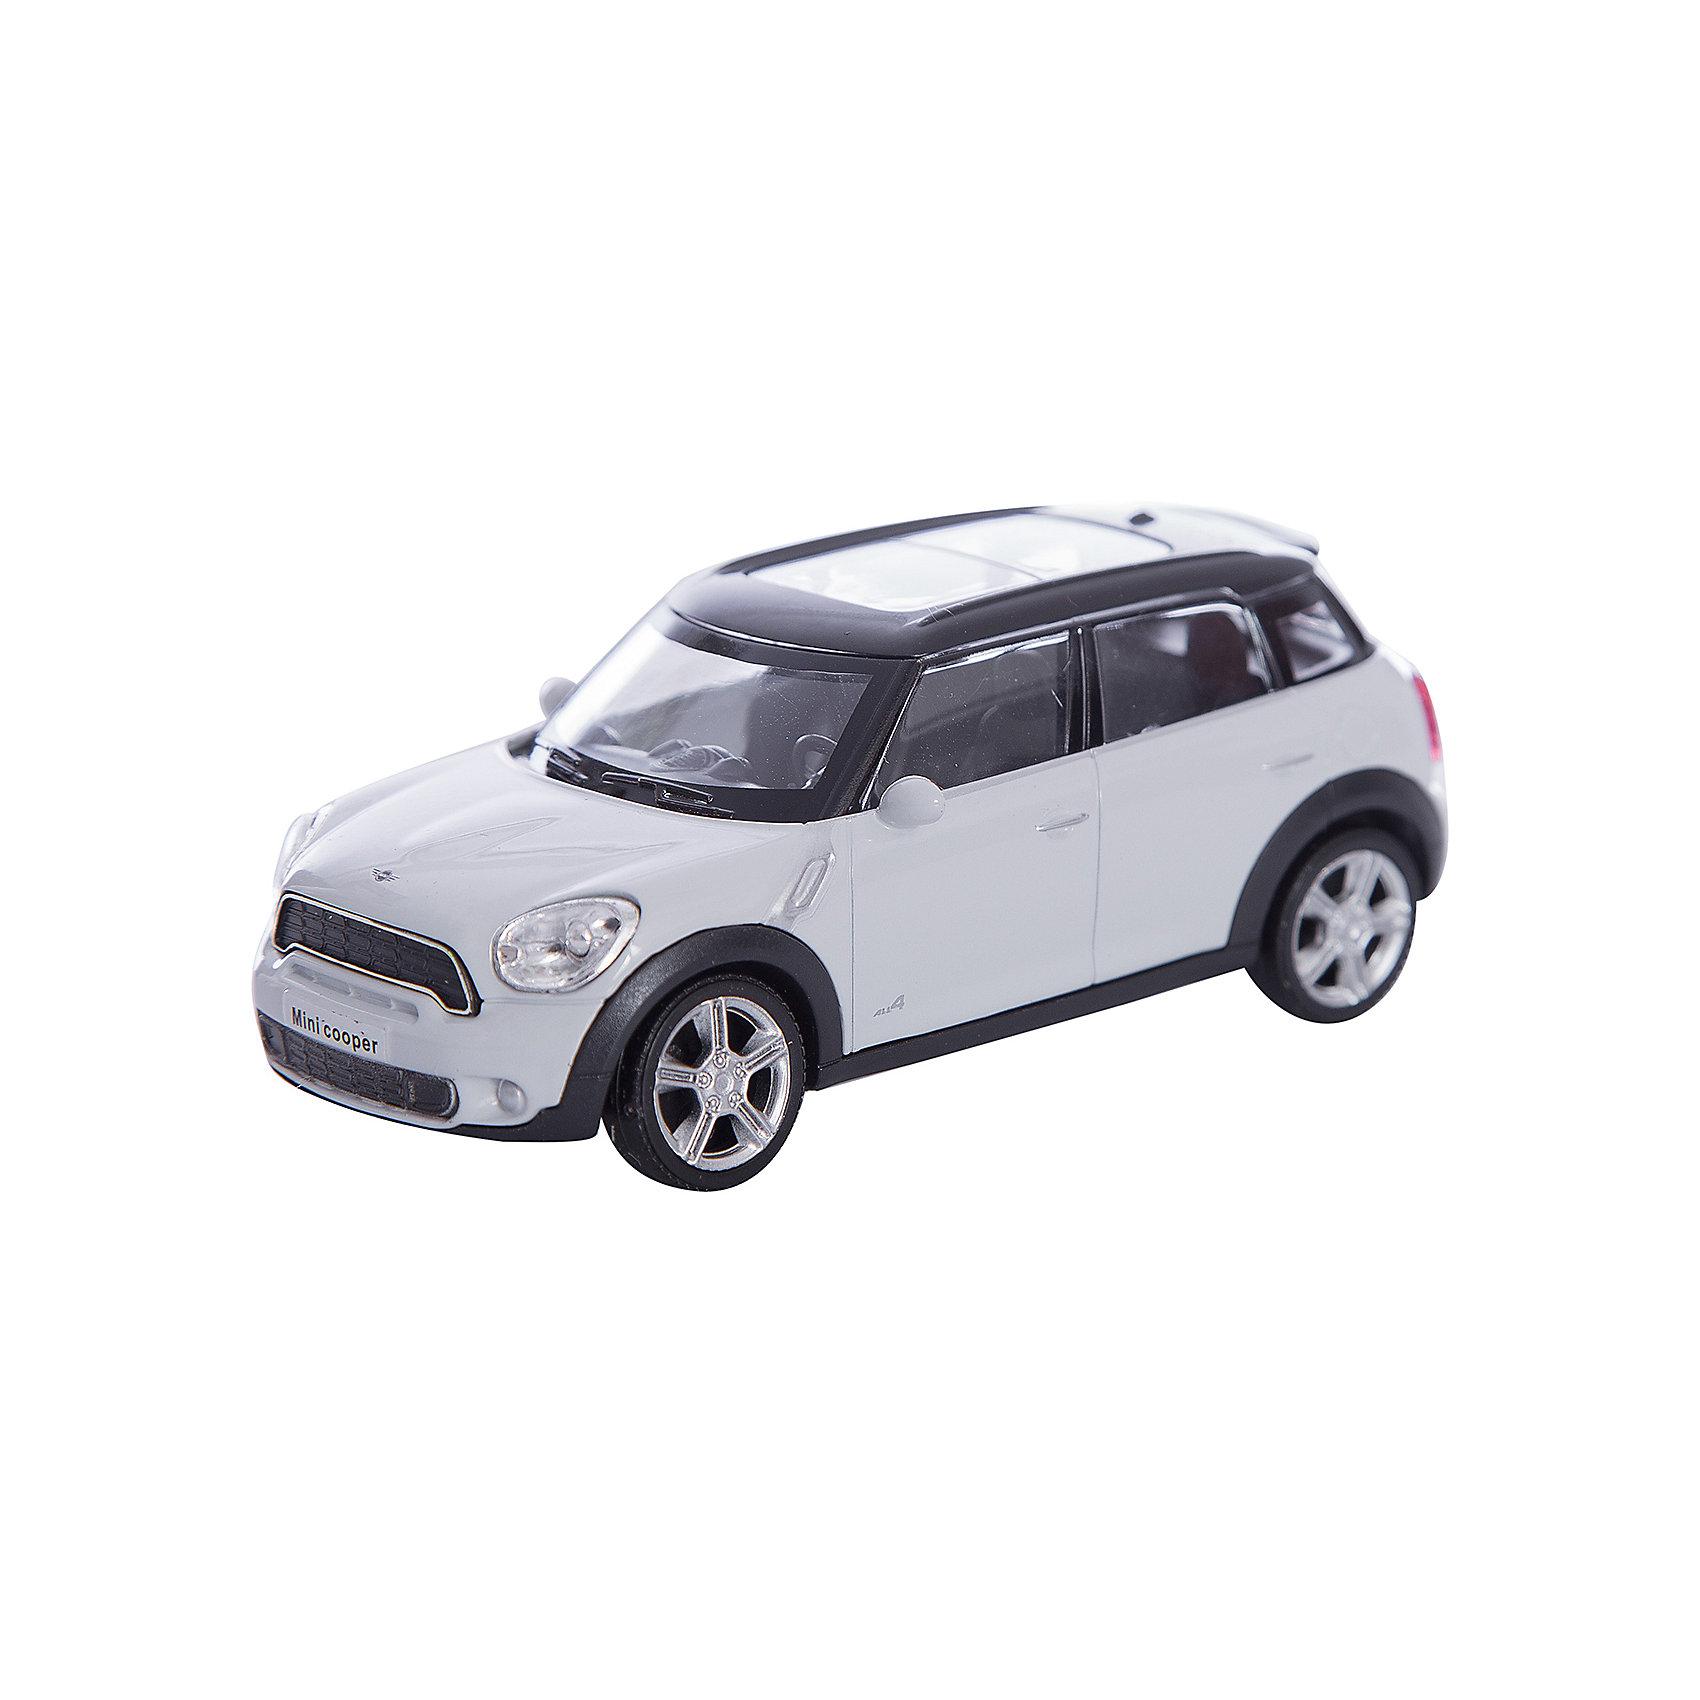 Машинка Mini Cooper S Countryman 1:43, AutotimeМашинки<br><br><br>Ширина мм: 165<br>Глубина мм: 57<br>Высота мм: 75<br>Вес г: 13<br>Возраст от месяцев: 36<br>Возраст до месяцев: 2147483647<br>Пол: Мужской<br>Возраст: Детский<br>SKU: 5584091